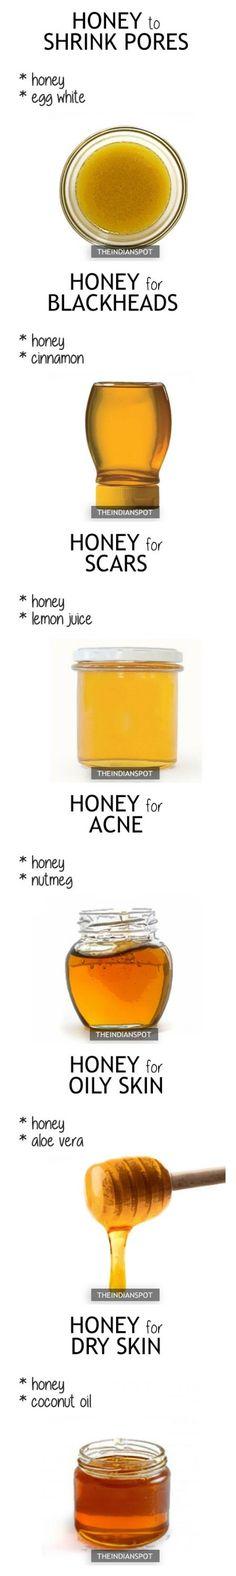 10 Simple Honey Face Masks for every skin problems - Schönheit Homemade Skin Care, Diy Skin Care, Homemade Beauty, Organic Skin Care, Natural Skin Care, Beauty Care, Beauty Hacks, Beauty Advice, Honey For Acne